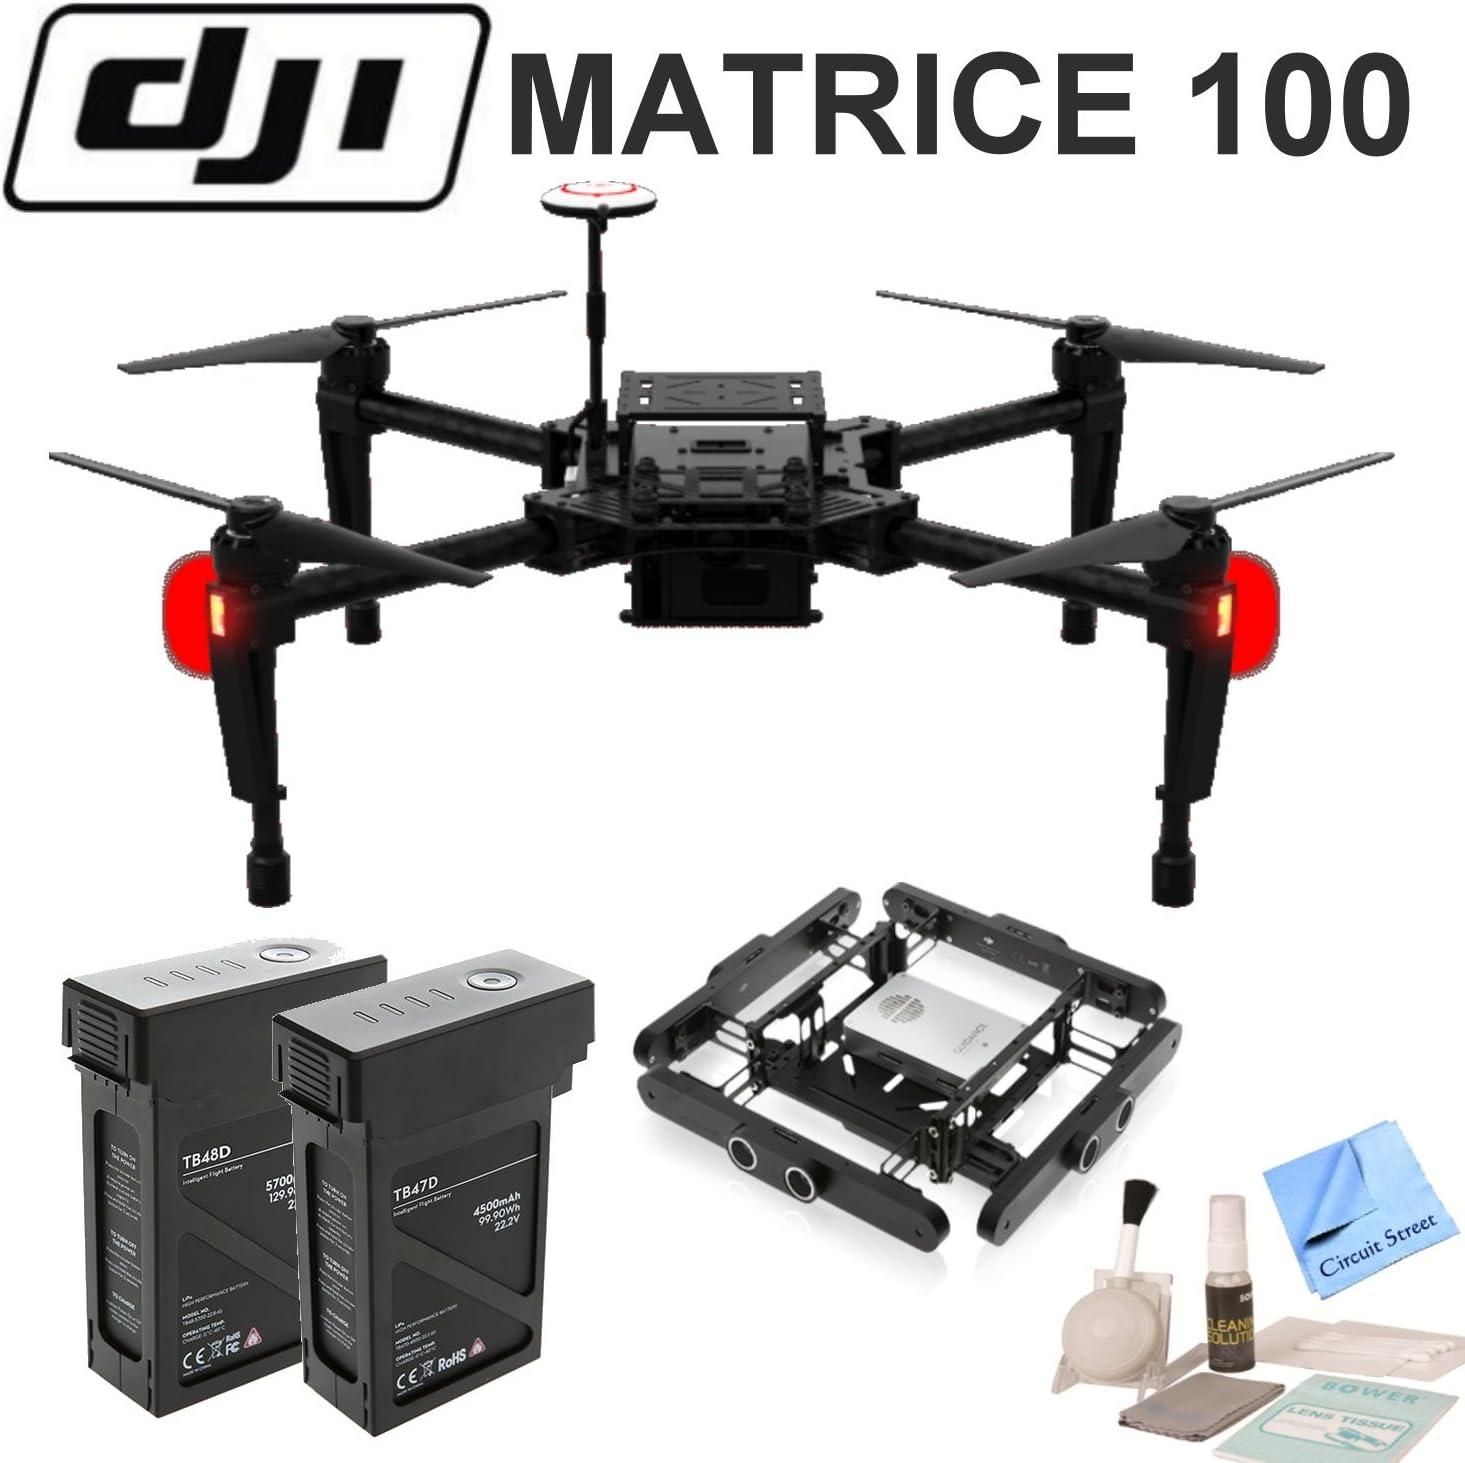 DJI Matrice 100 Review